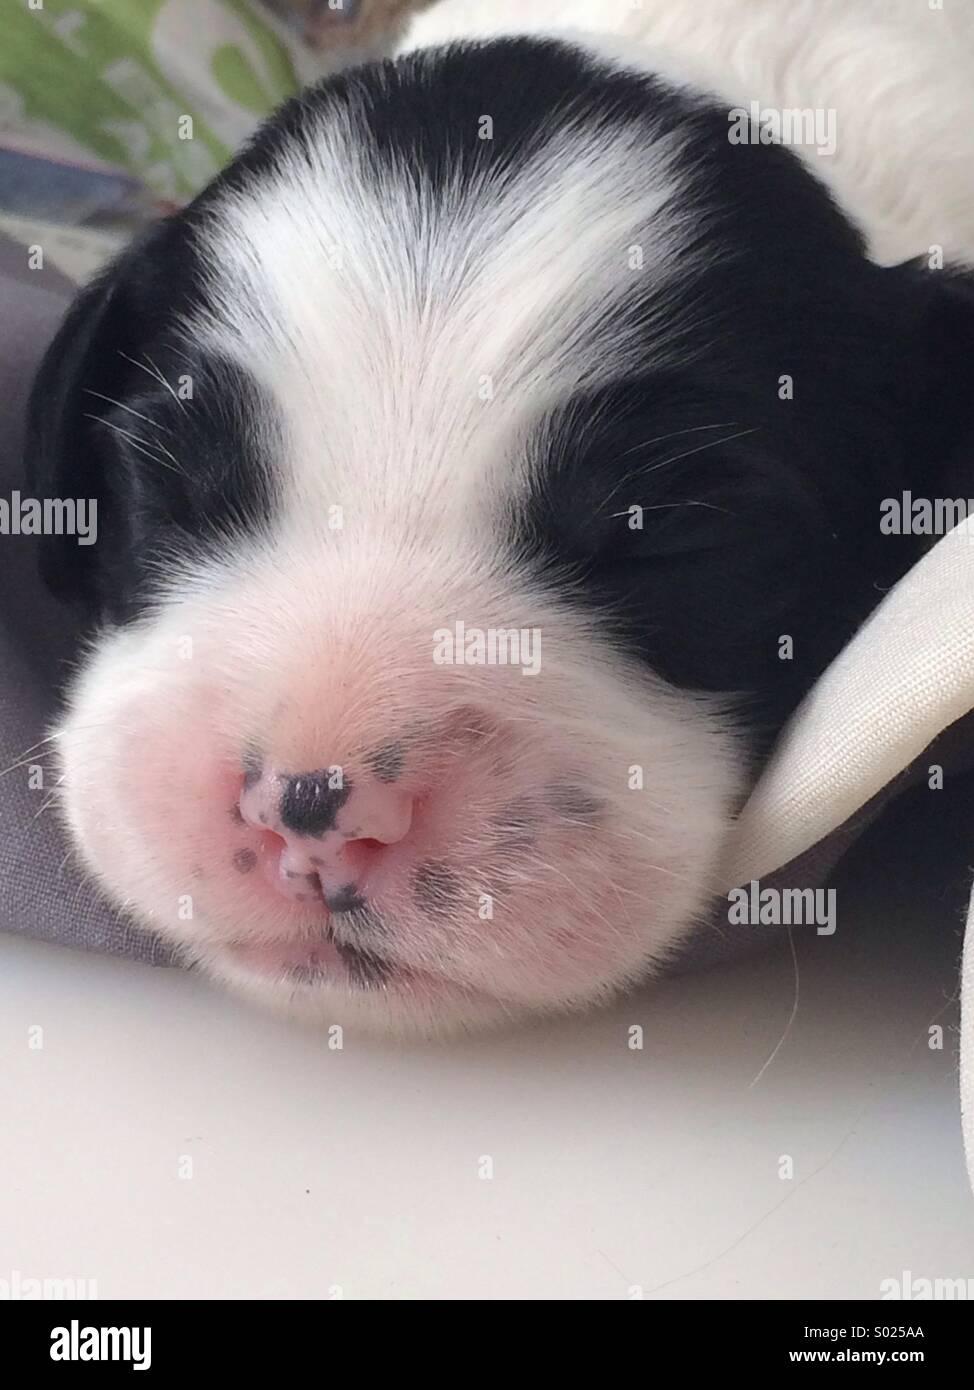 Cucciolo Foto Stock